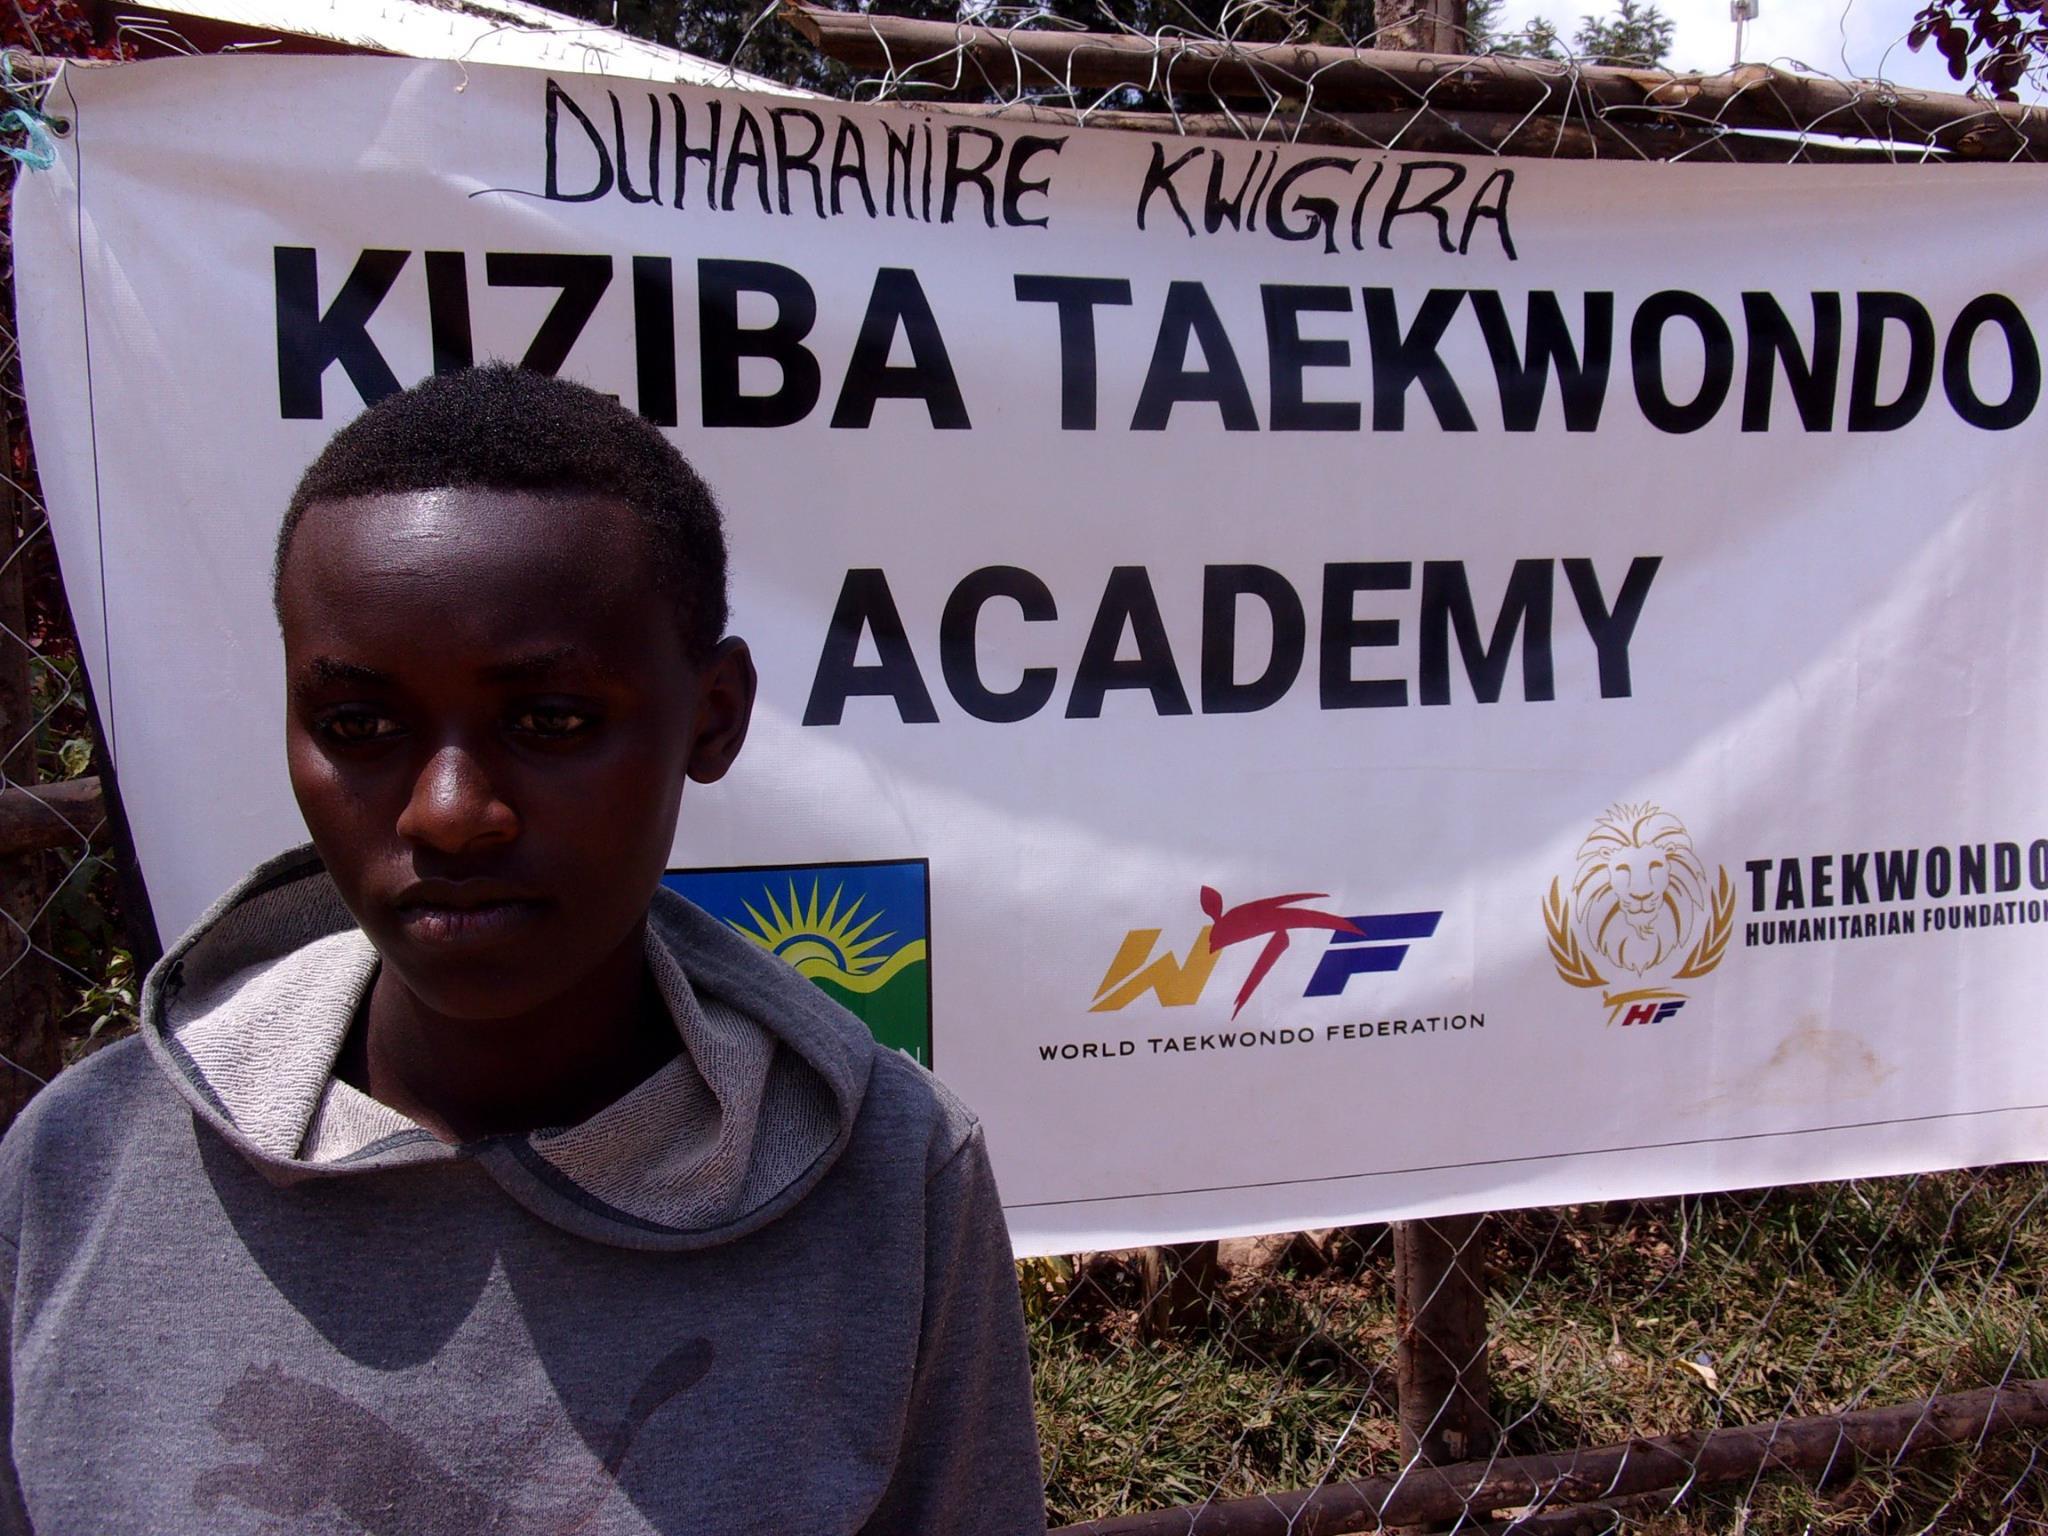 Teenager in Rwanda praises work of Taekwondo Humanitarian Foundation